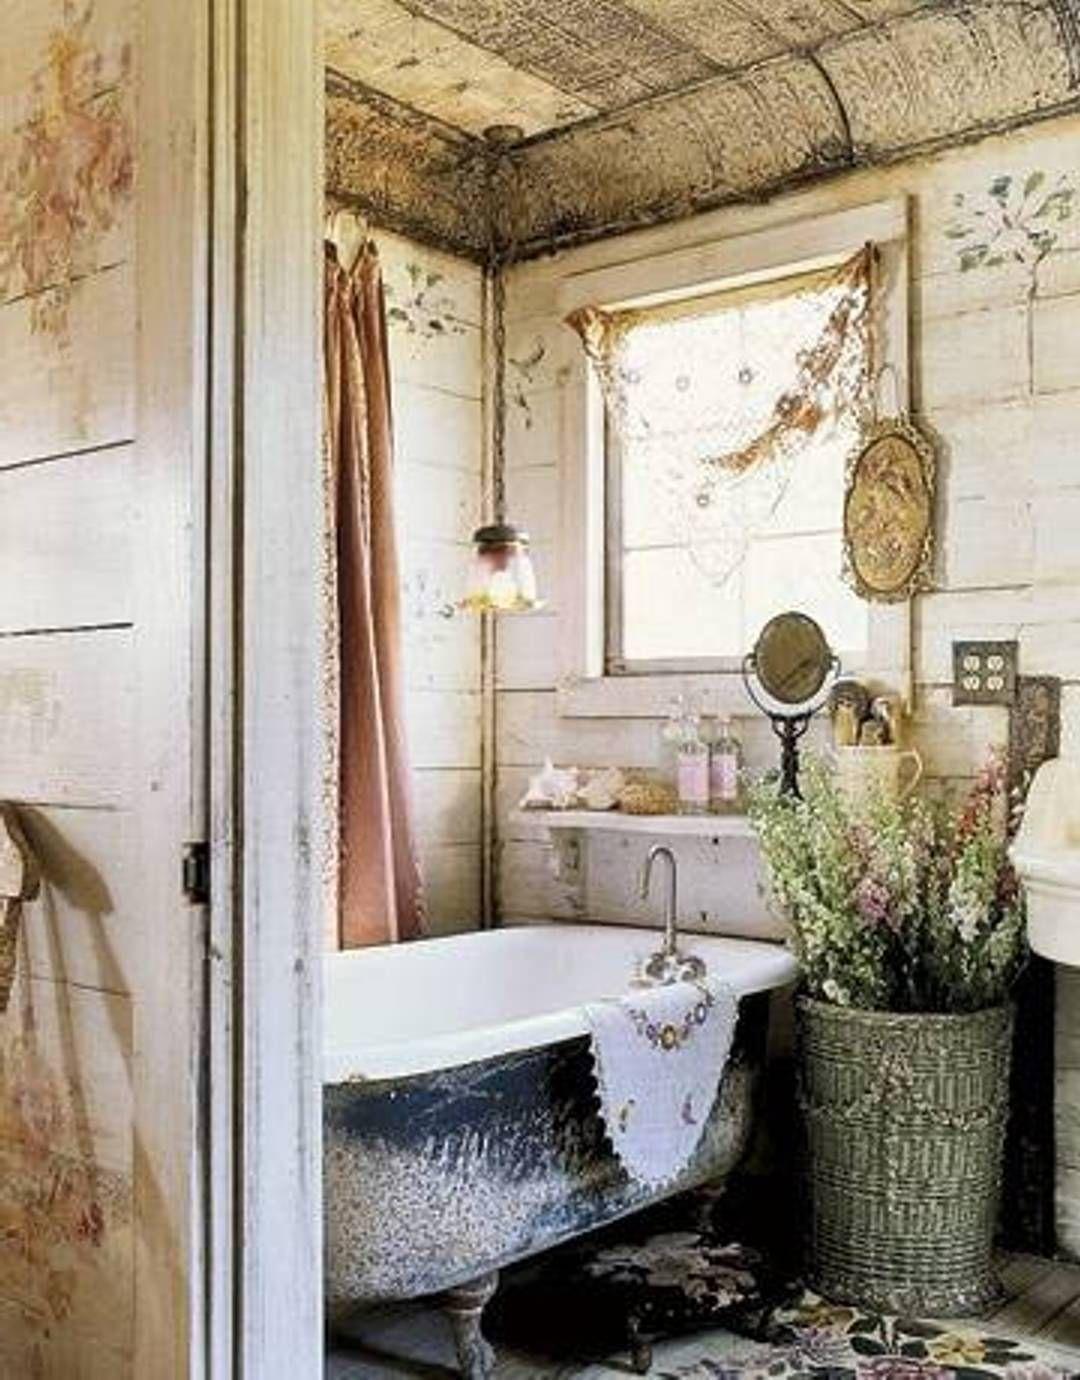 Primitive Country Bathroom Ideas Google Search Romantic Bathrooms Shabby Chic Bathroom Decor Country Style Bathrooms